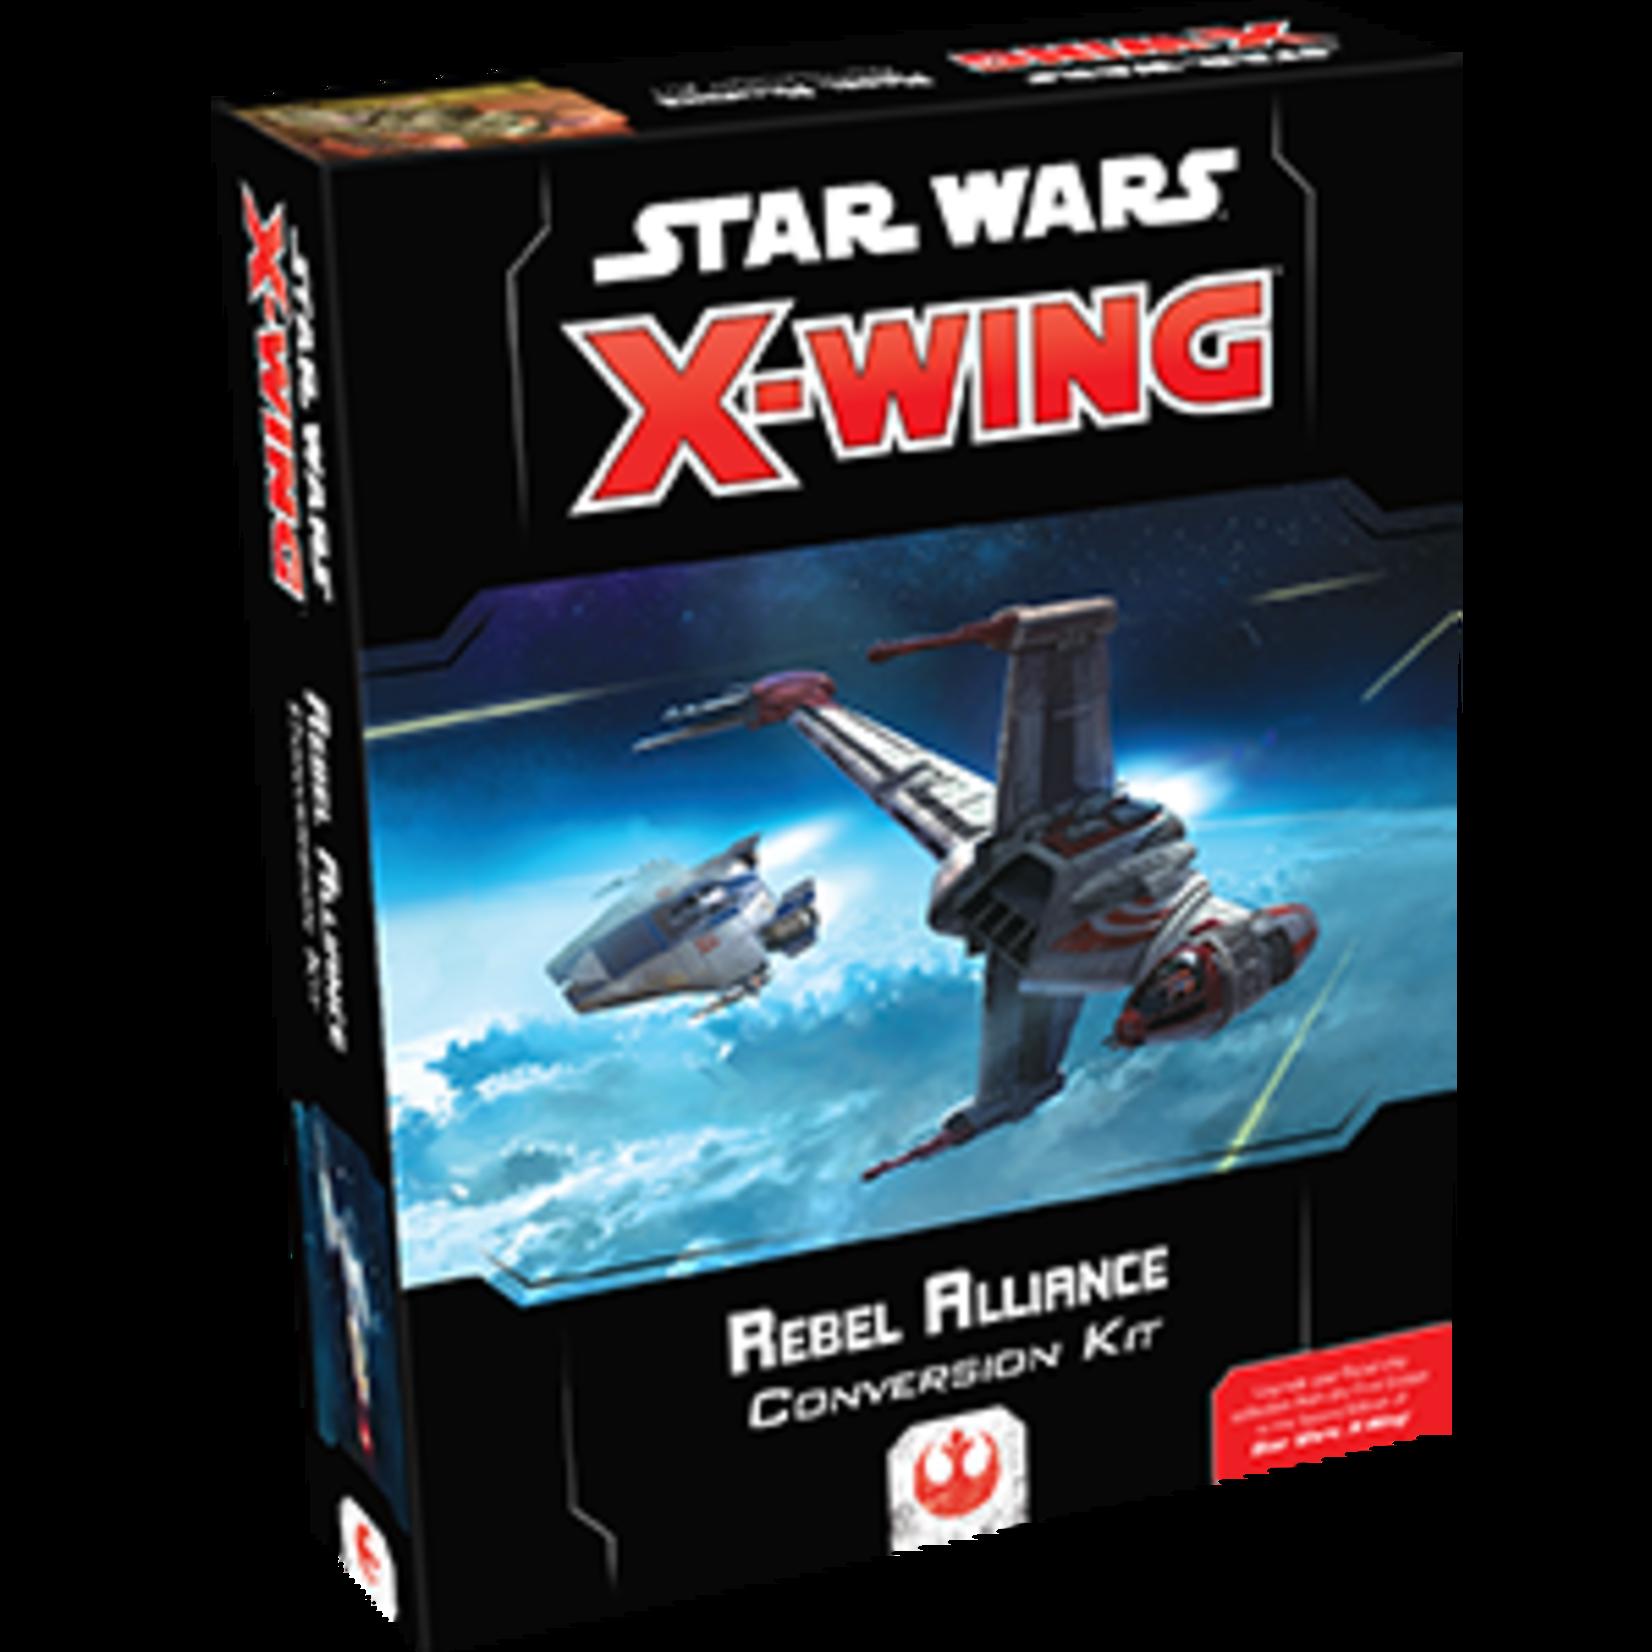 Fantasy Flight Games Star Wars X-Wing 2nd Edition: Rebel Conversion Kit (Expansion)